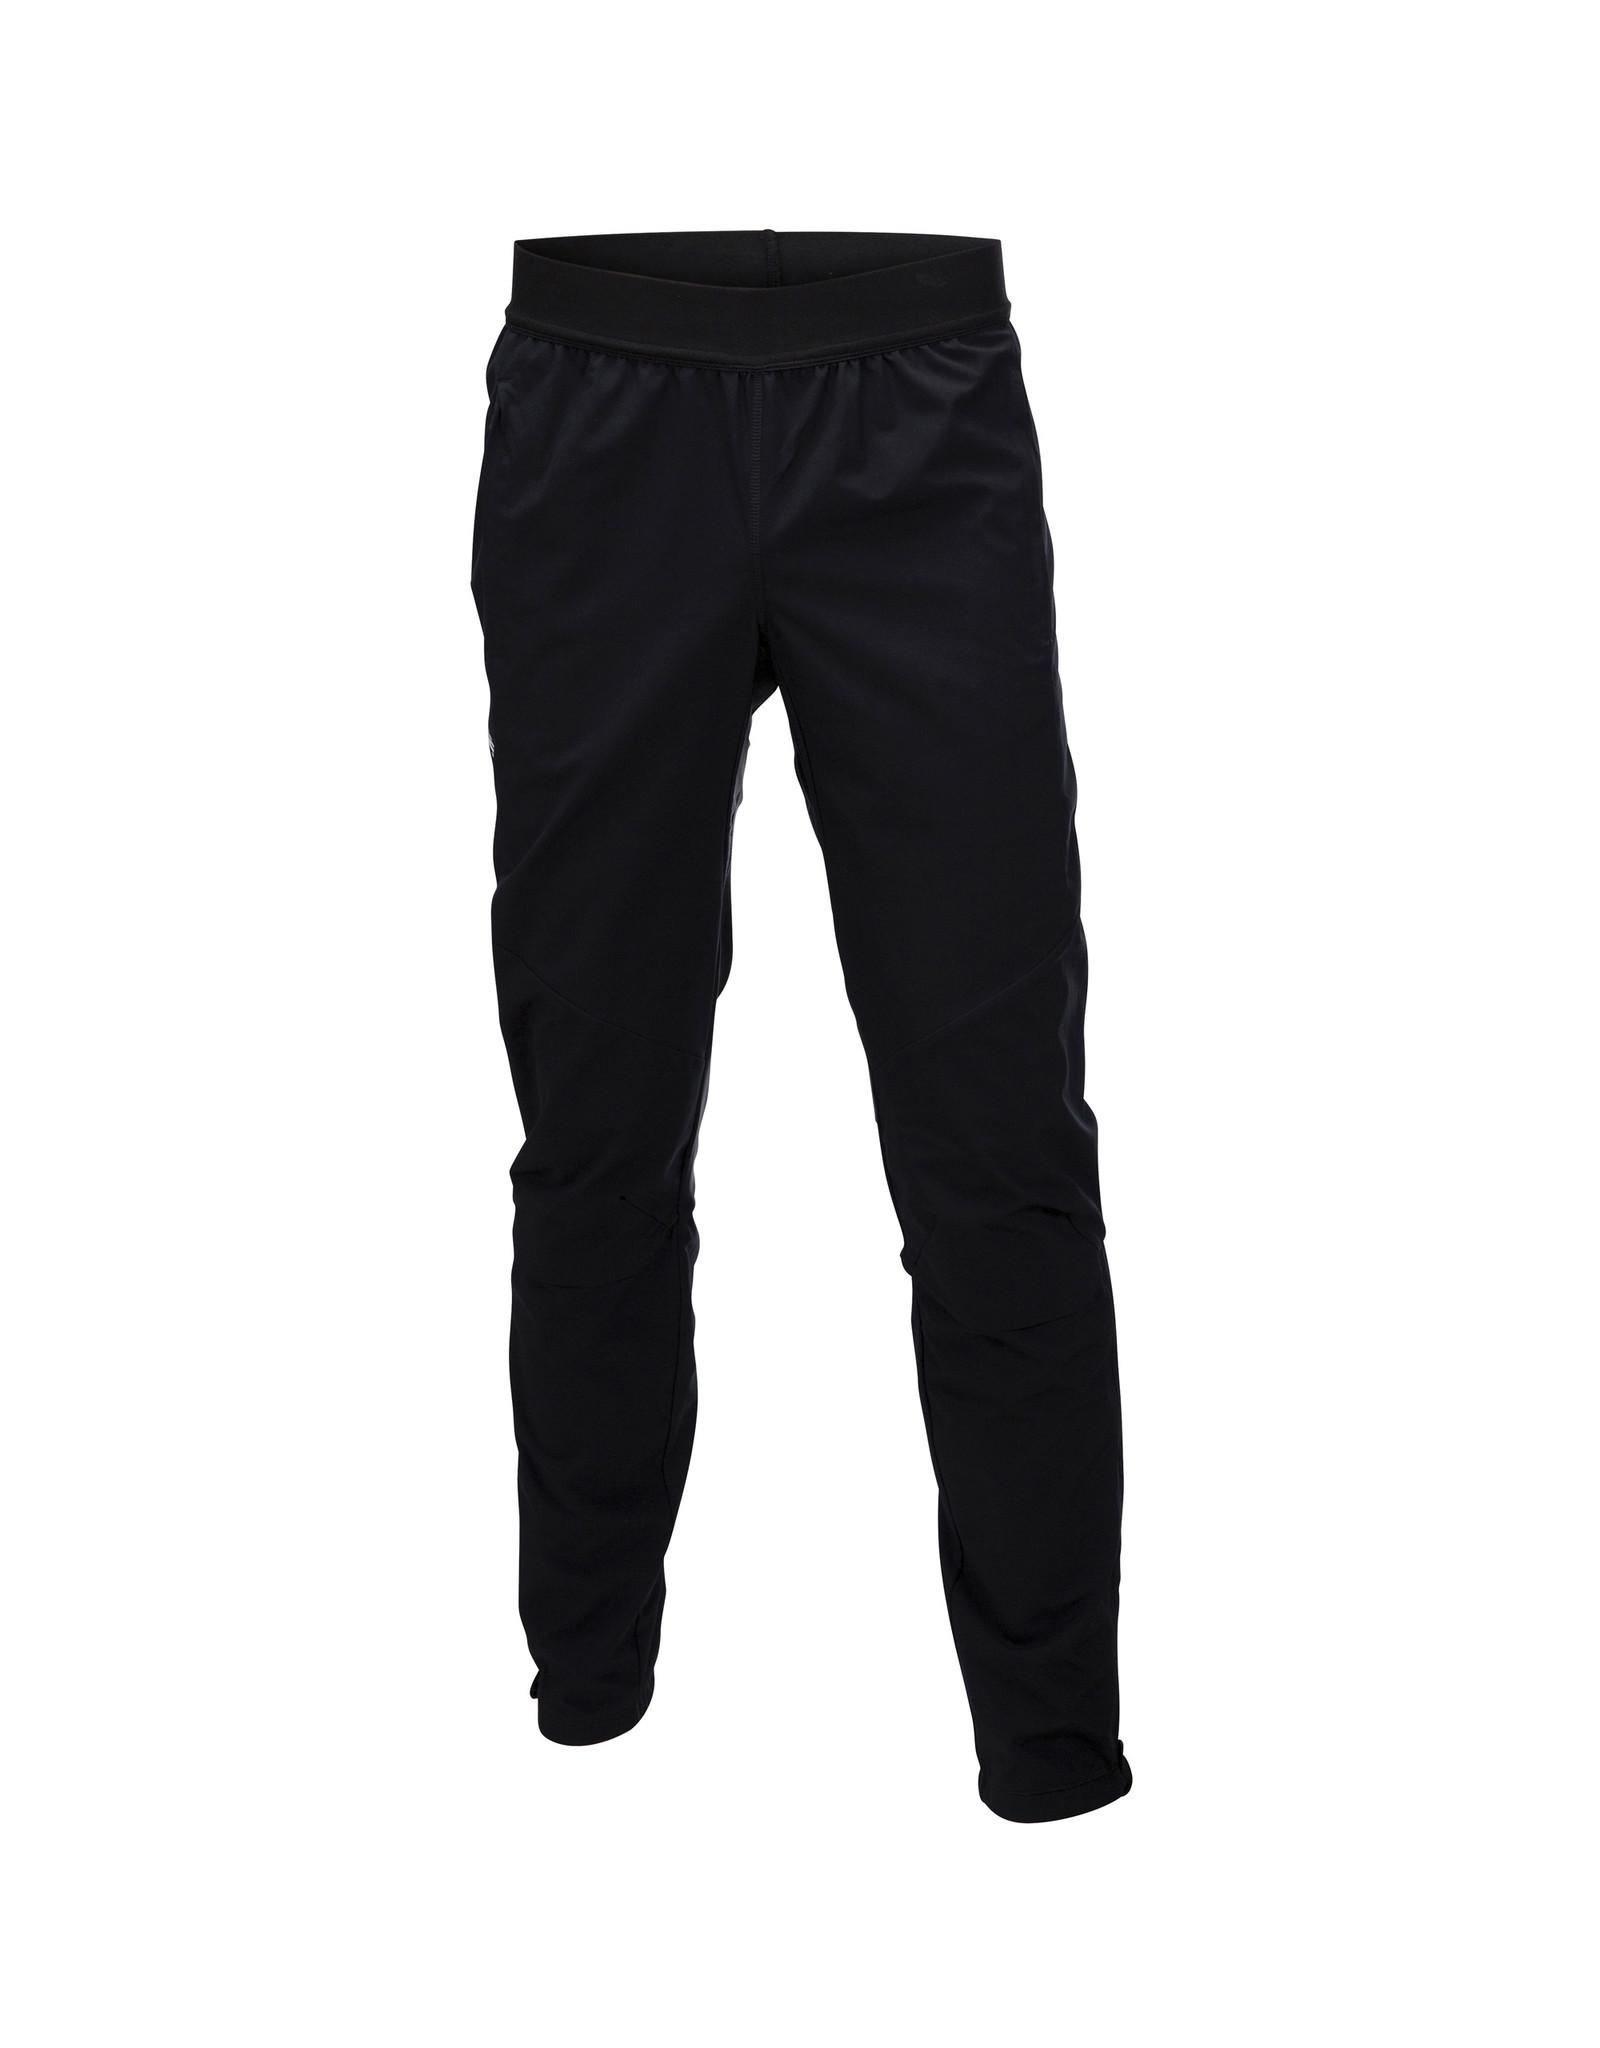 Swix Star XC Pants Mens XL (10000) Black